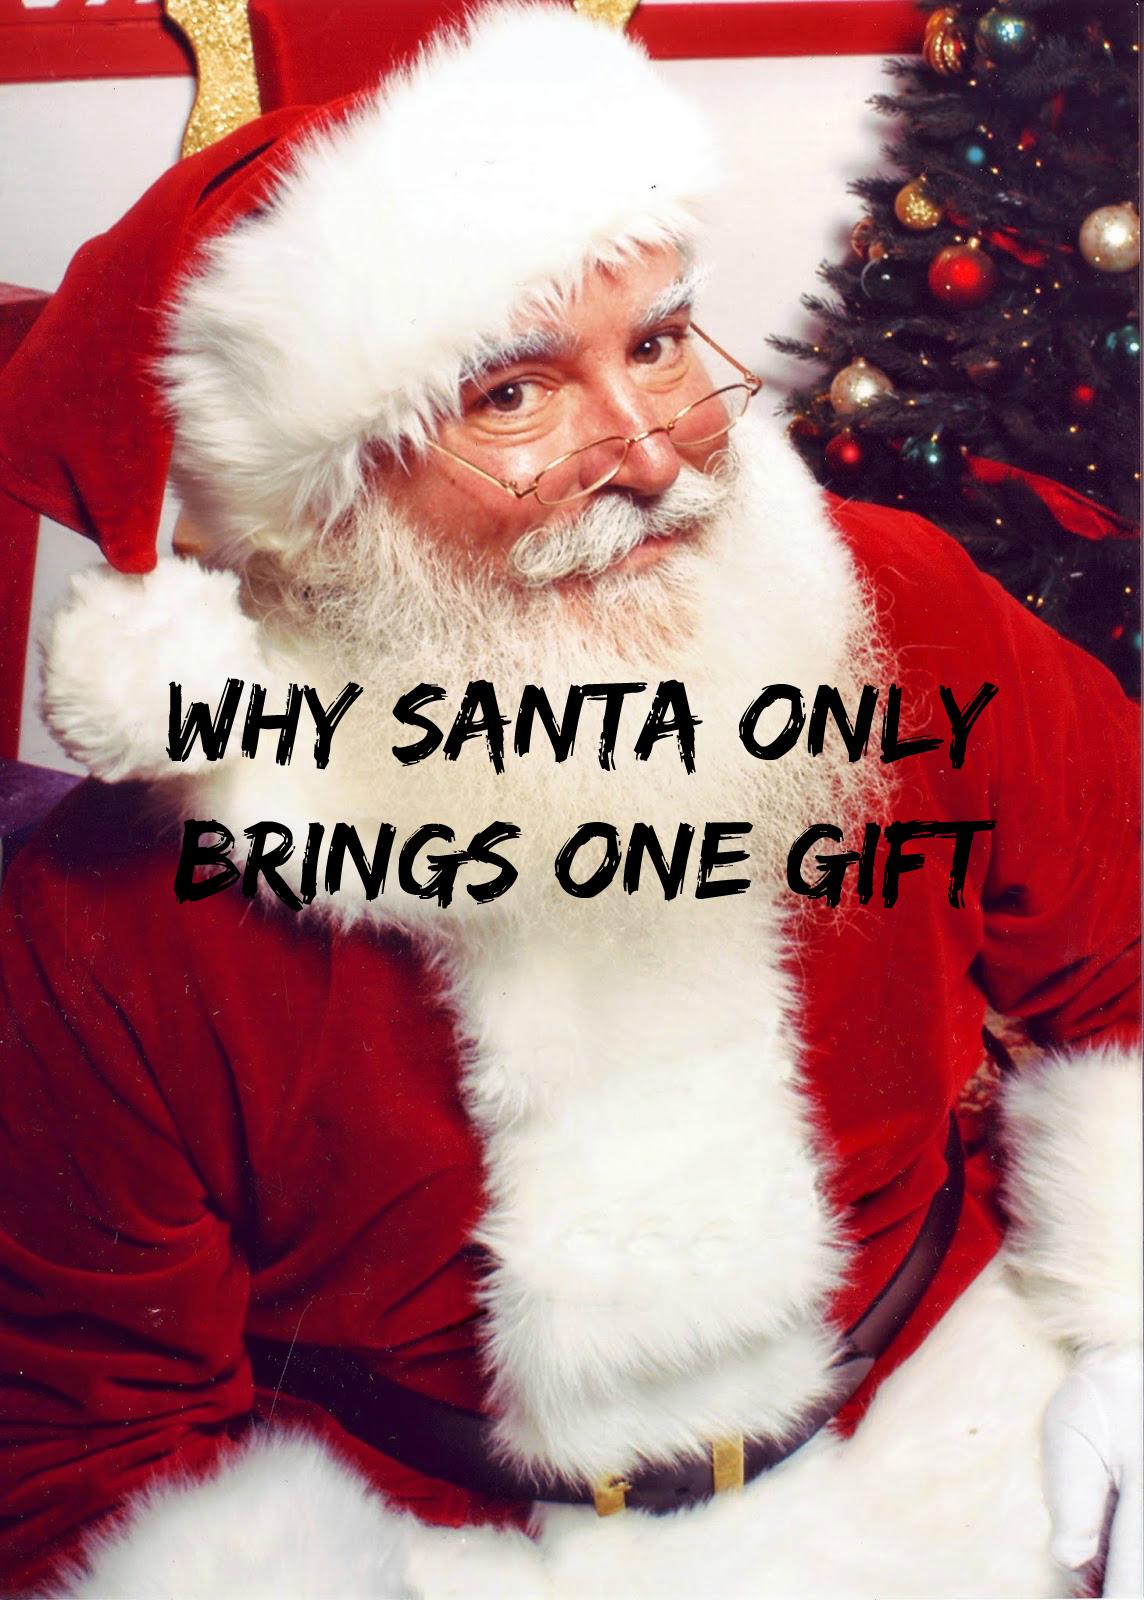 santa 1 - What To Do Christmas Day